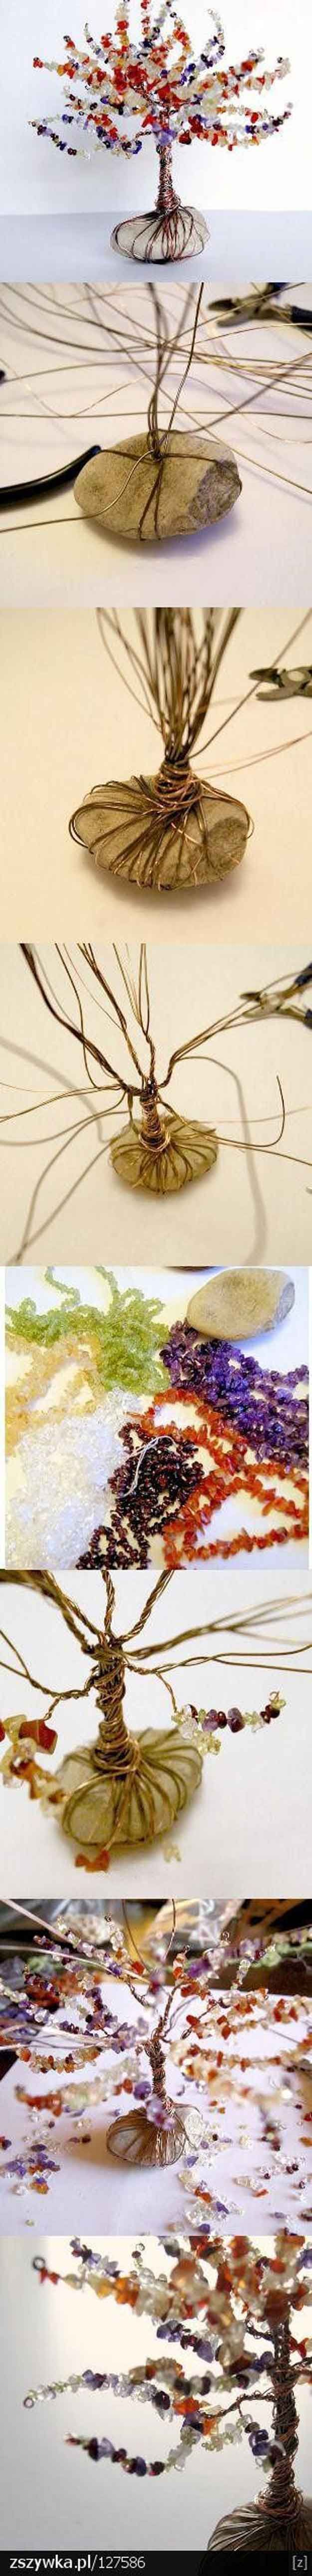 DIY Tree of Life Ideas To Make | Draht, Kunst und Kreativ